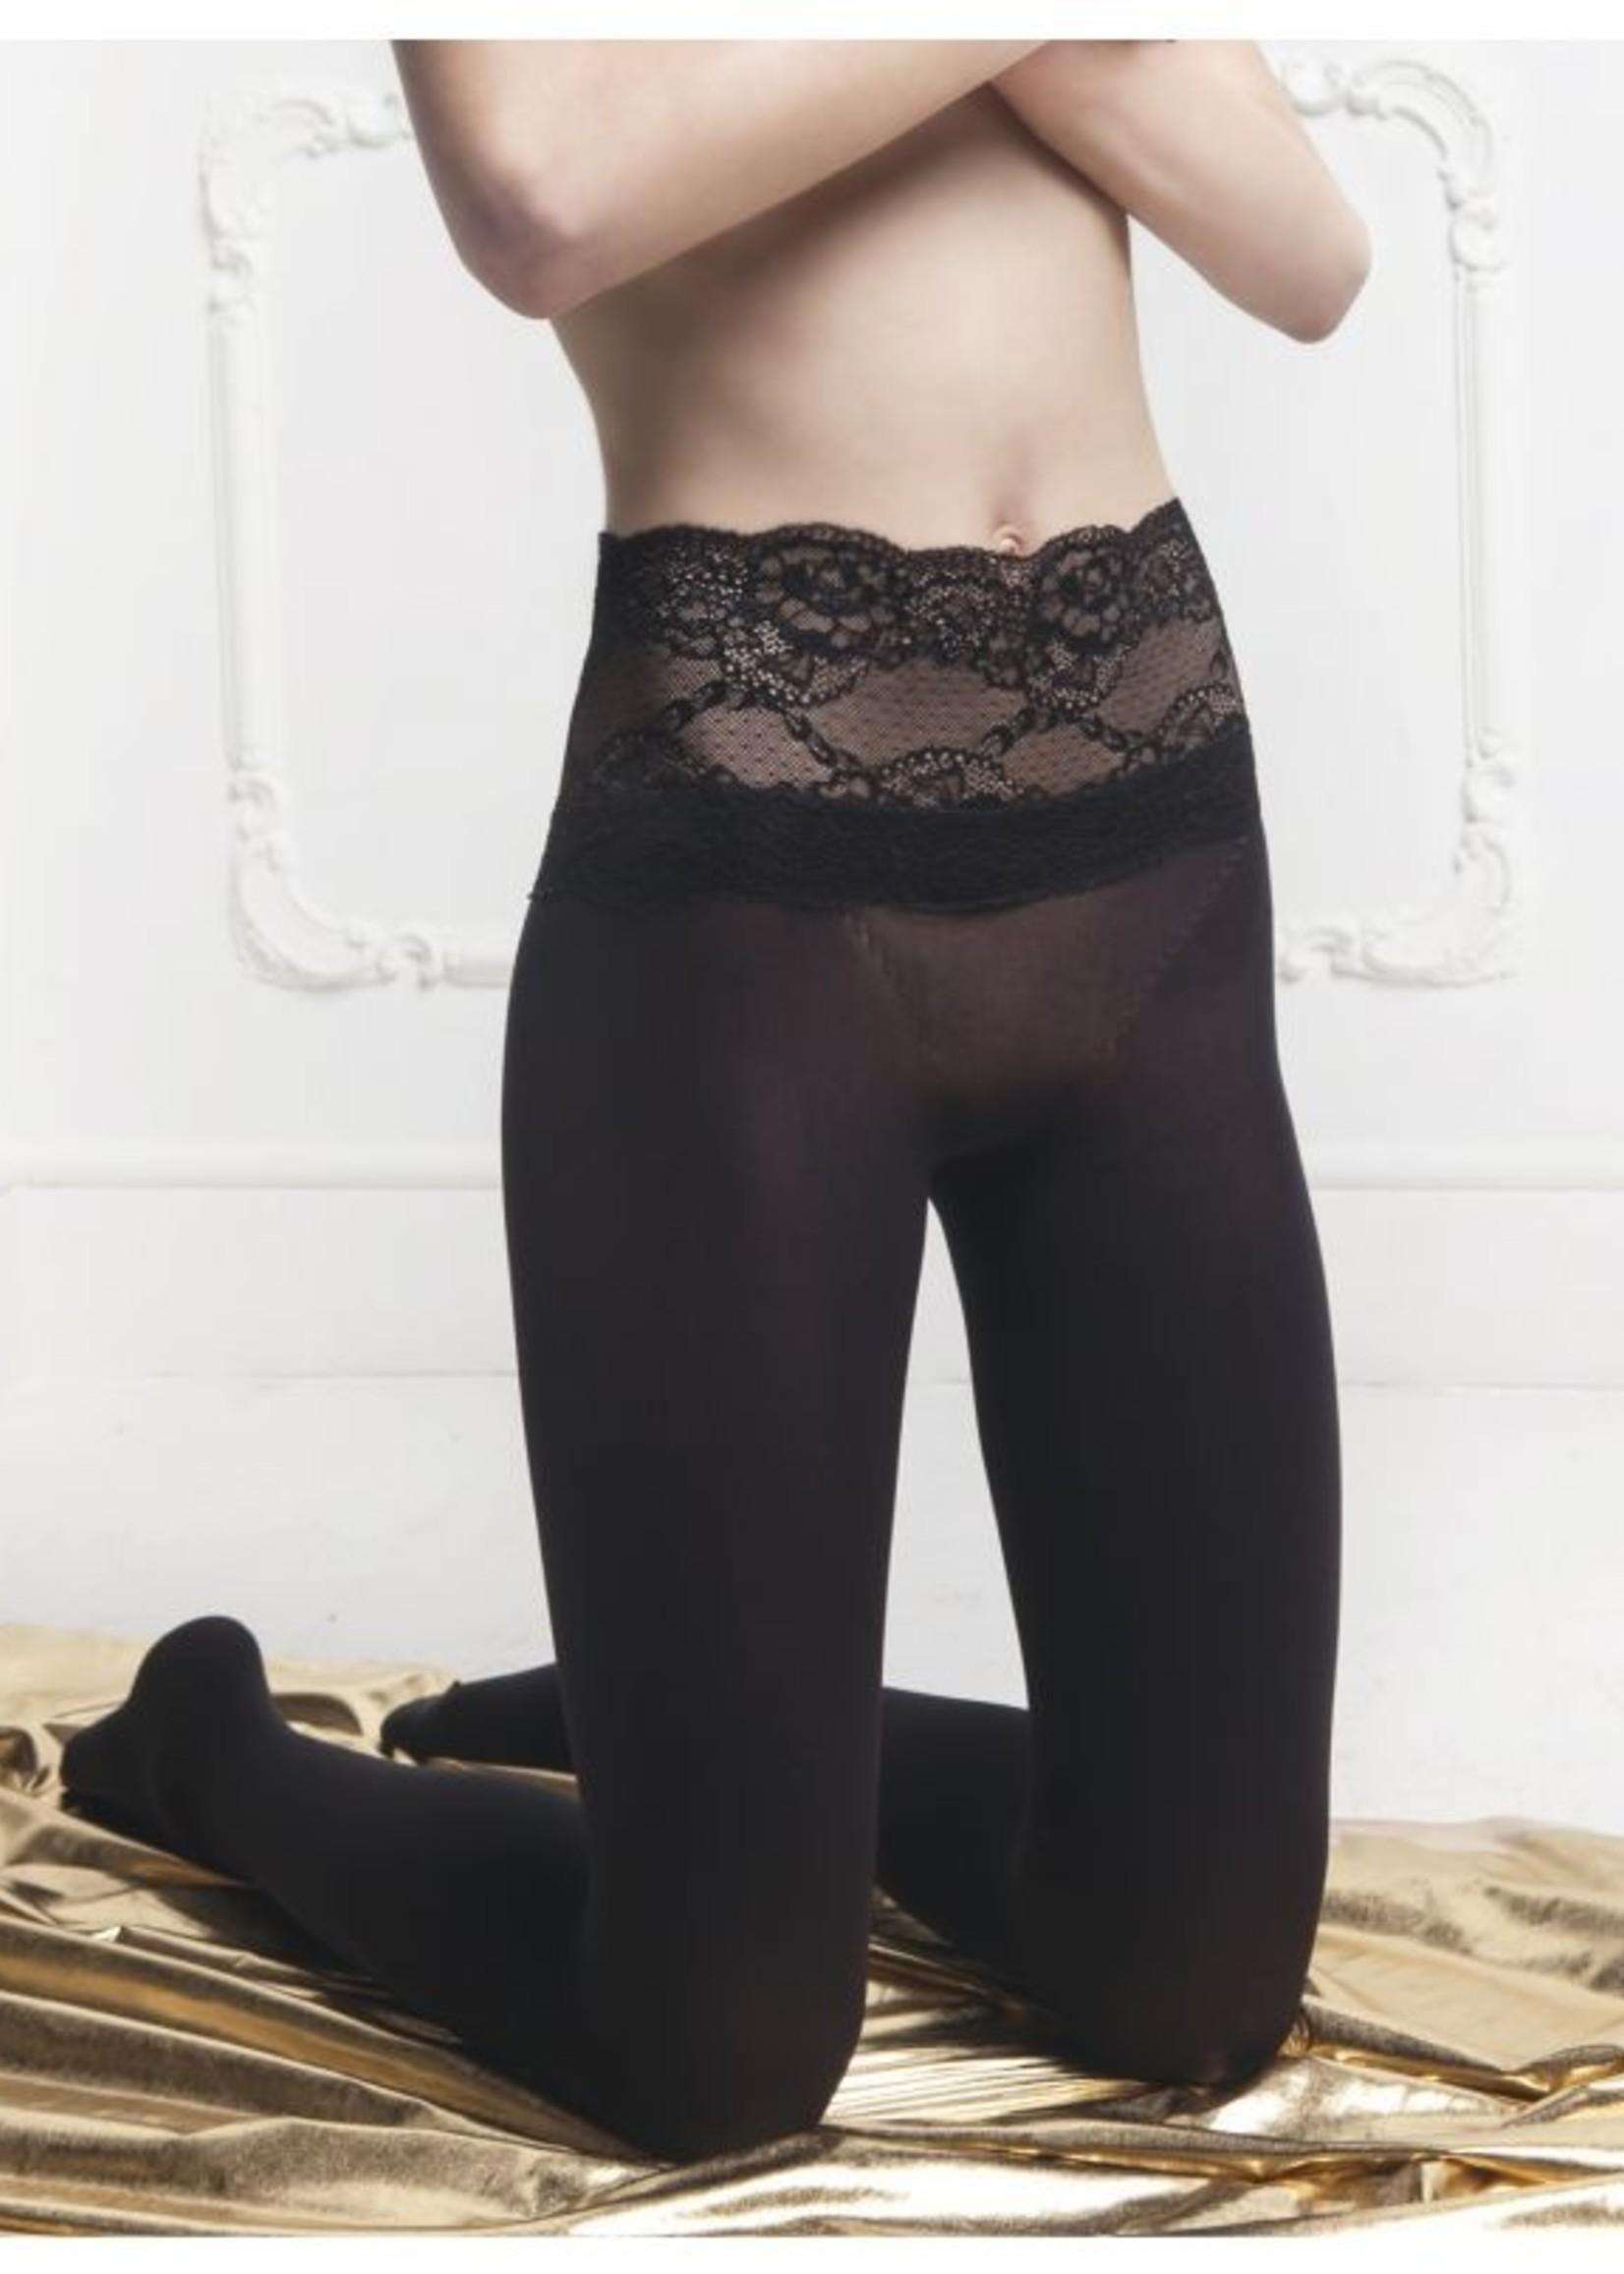 Philippe Matignon Nudite Vanite Tights